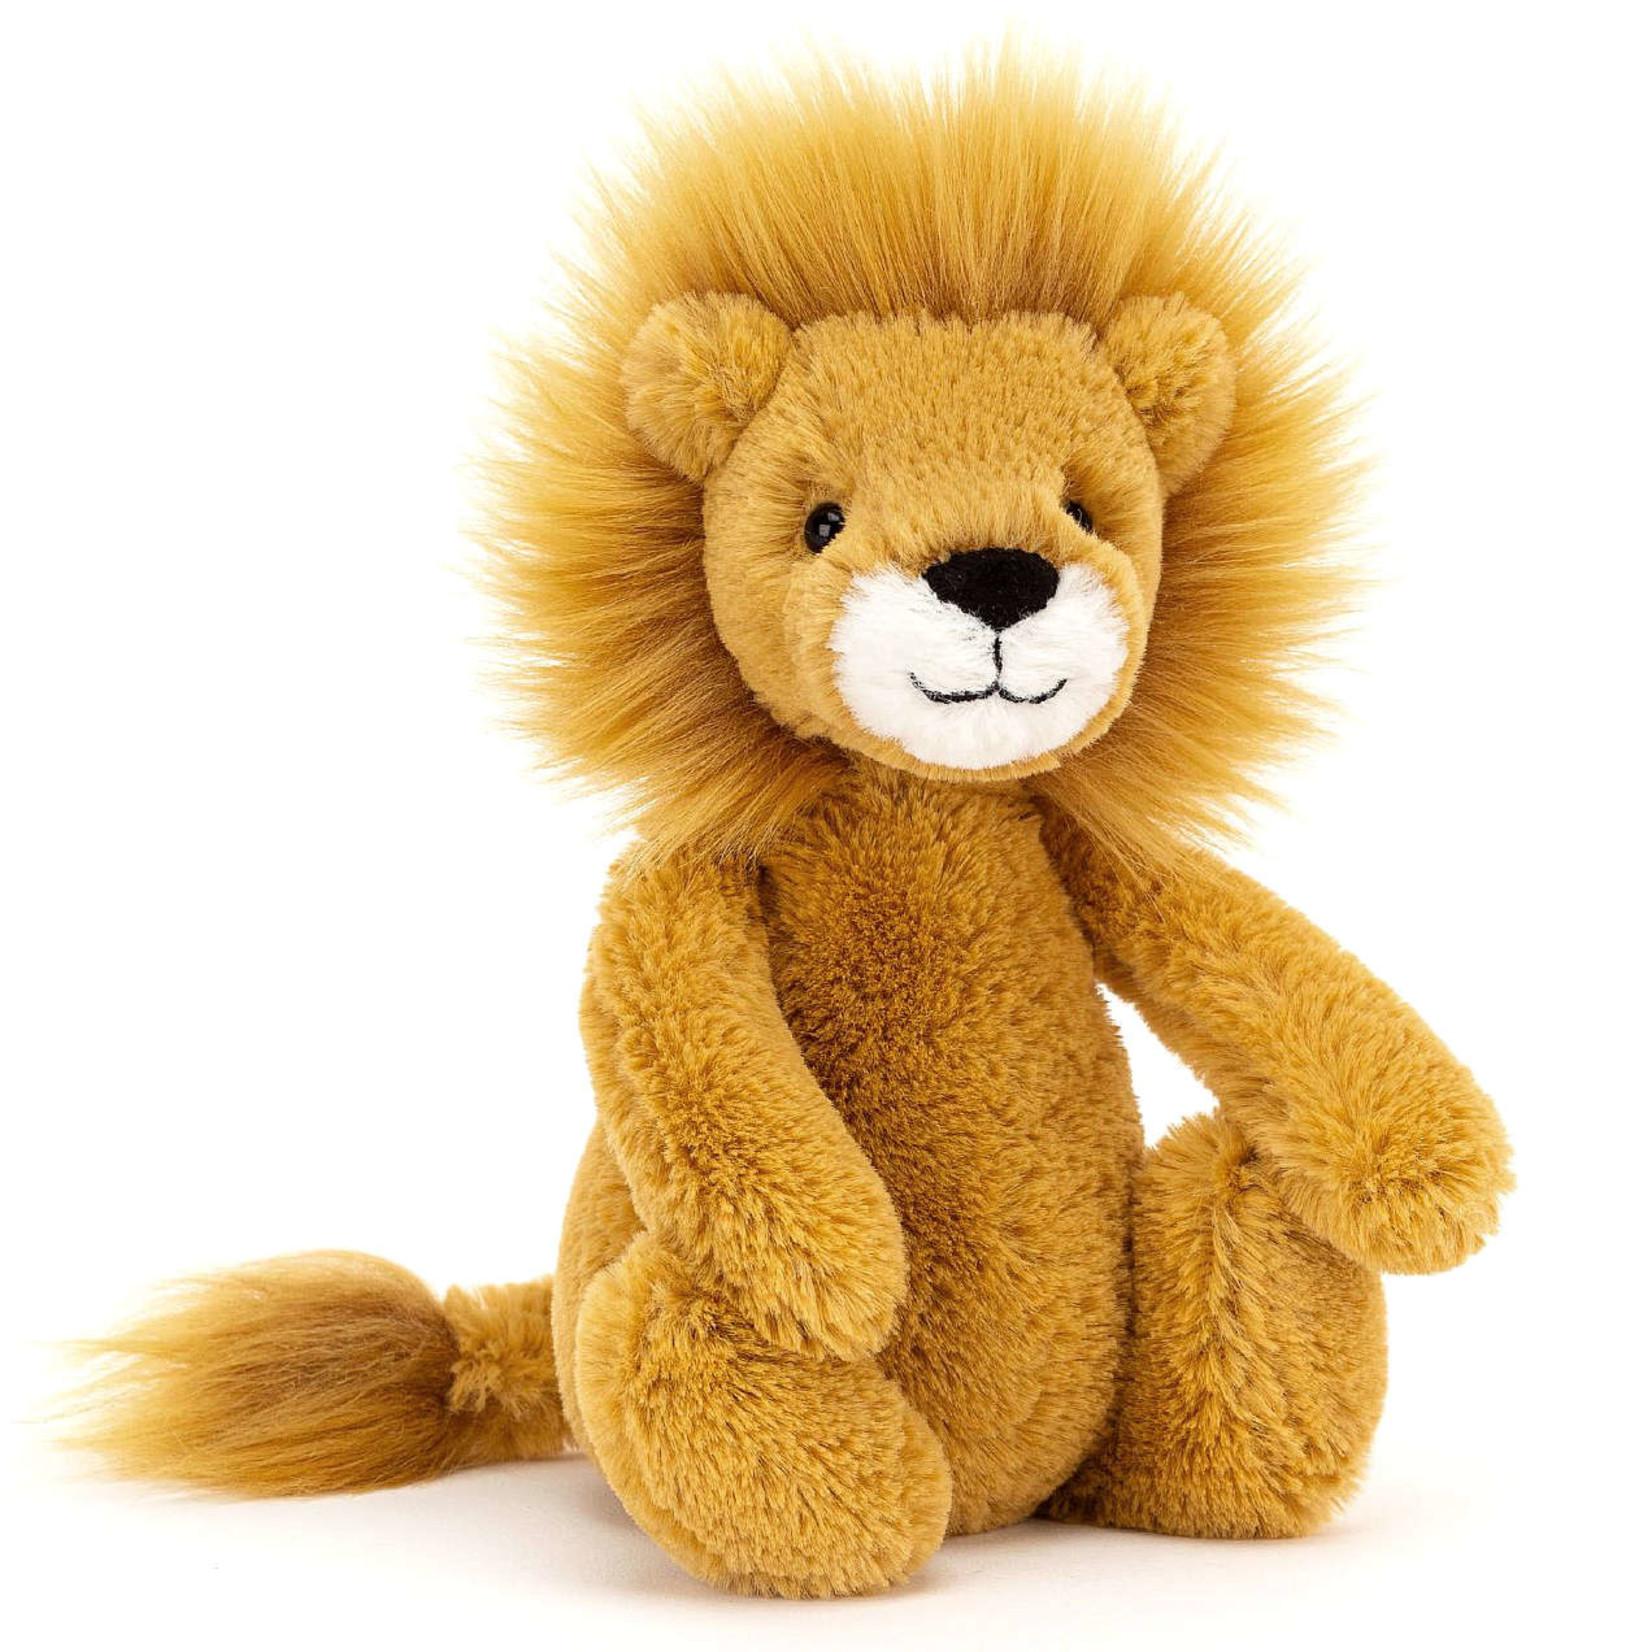 JELLYCAT MEDIUM BASHFUL LION